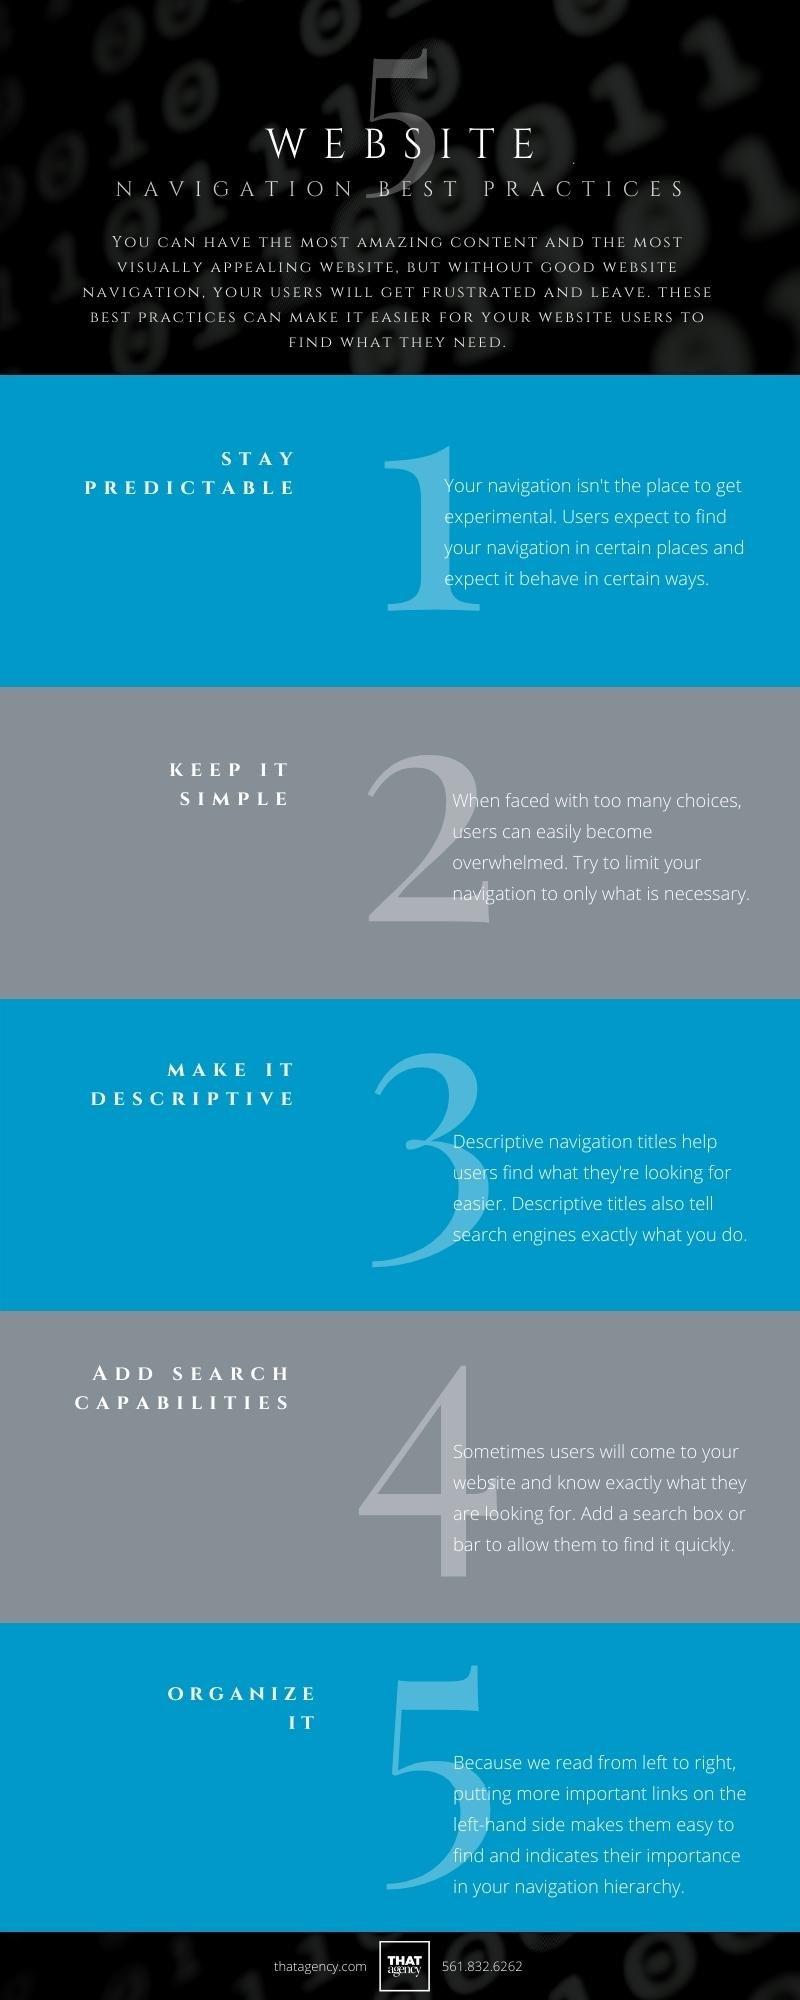 website-navigation-best-practices-infographic